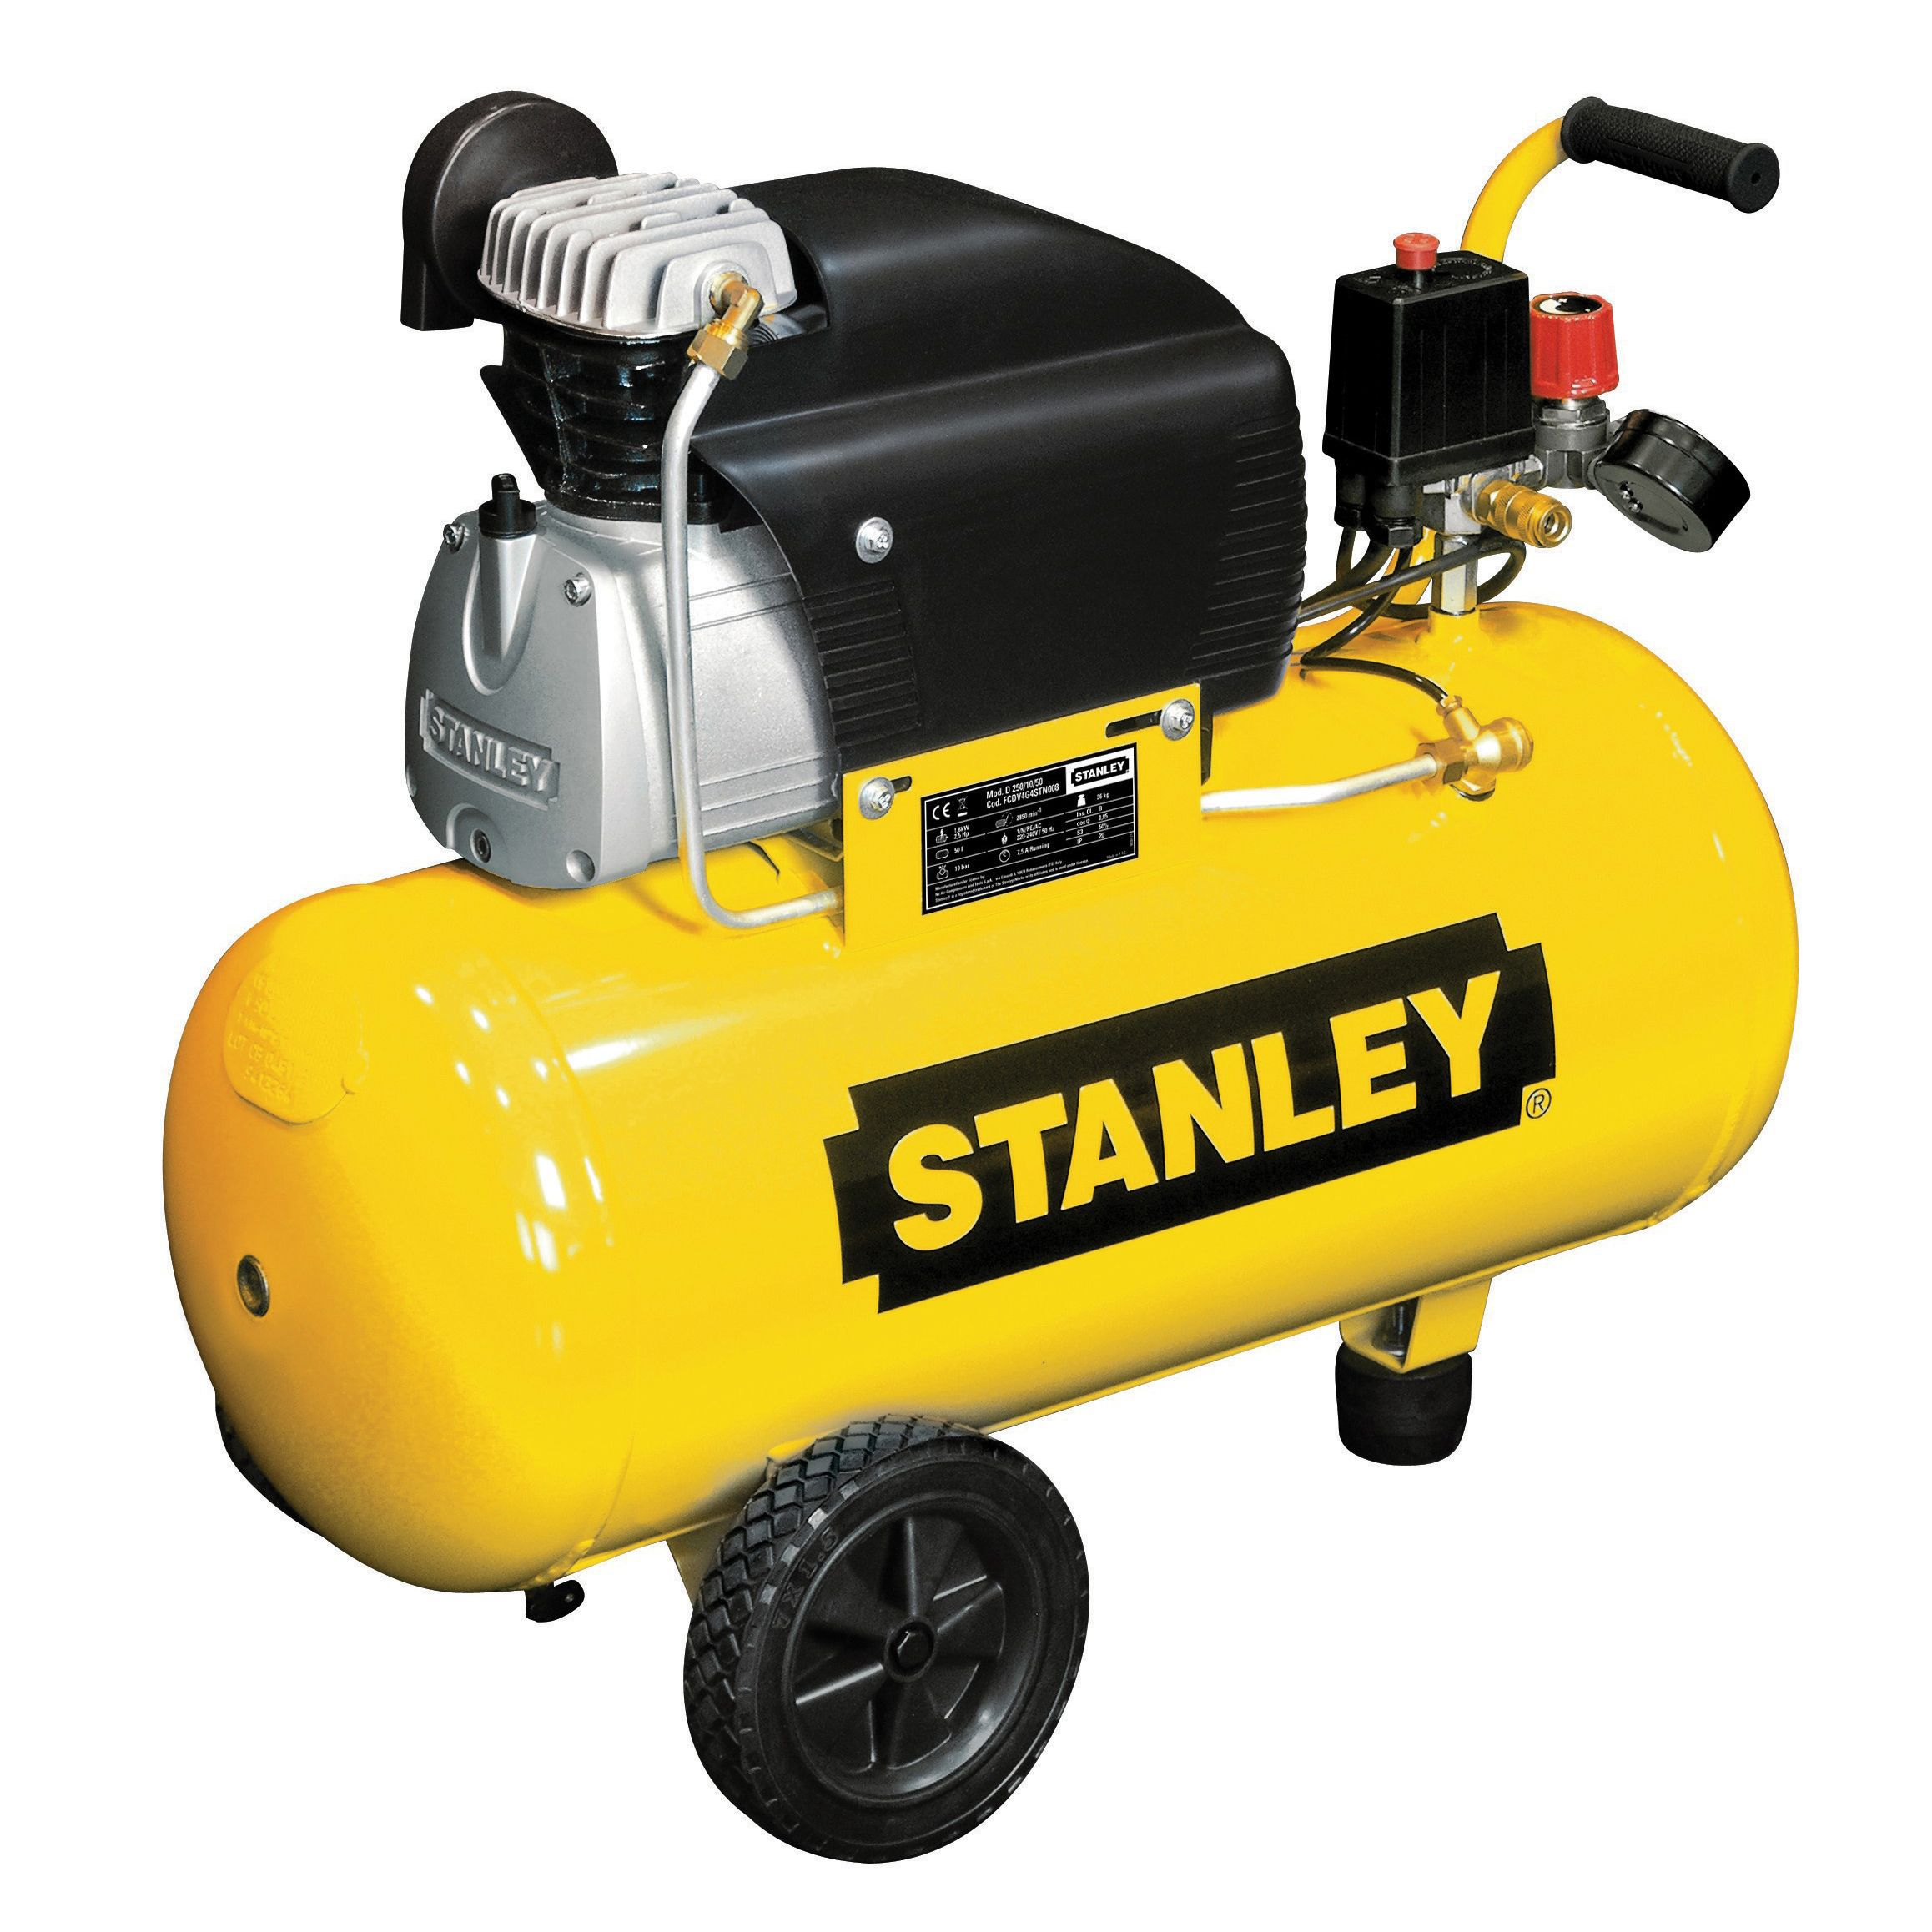 Stanley 50l Compressor Fcdv4g4scr006 Departments Diy